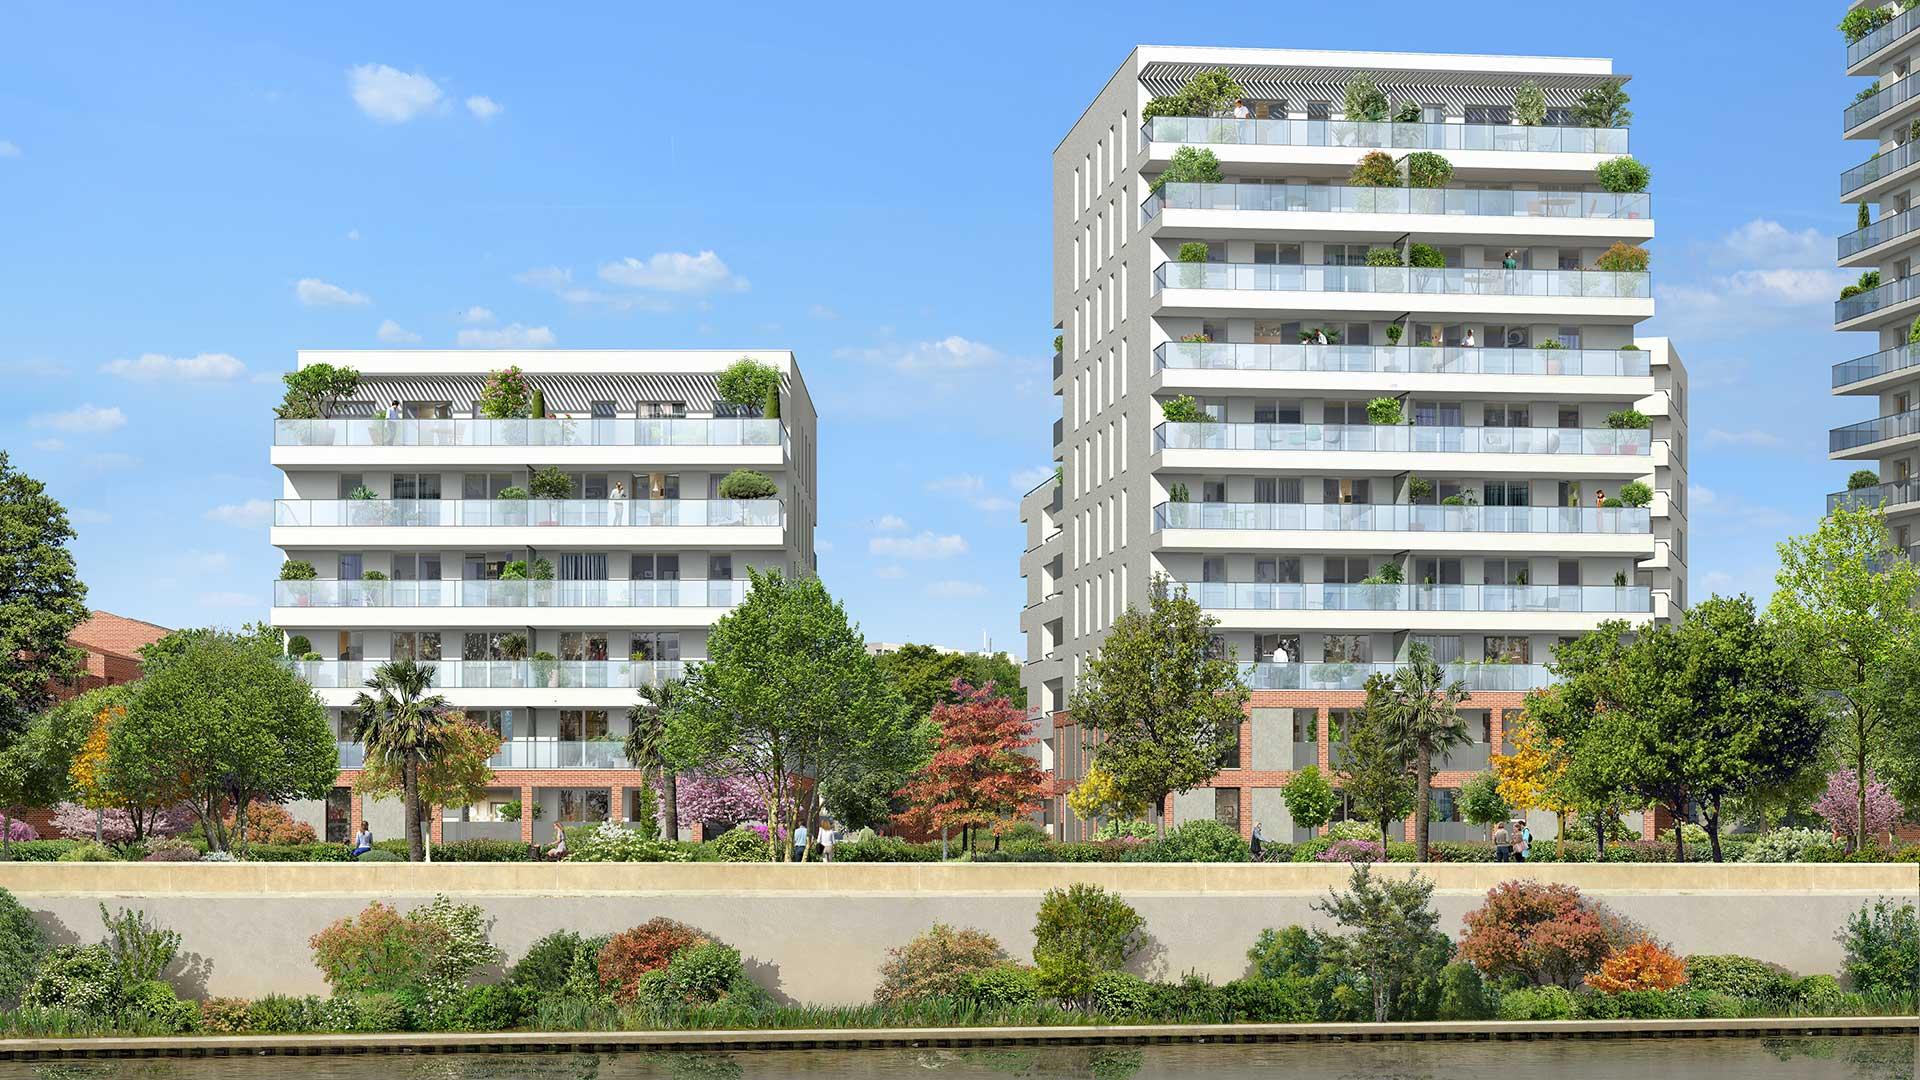 Urbanhouse360-Kaufman-Broad-Terre-Garonne_ImmeubleEst